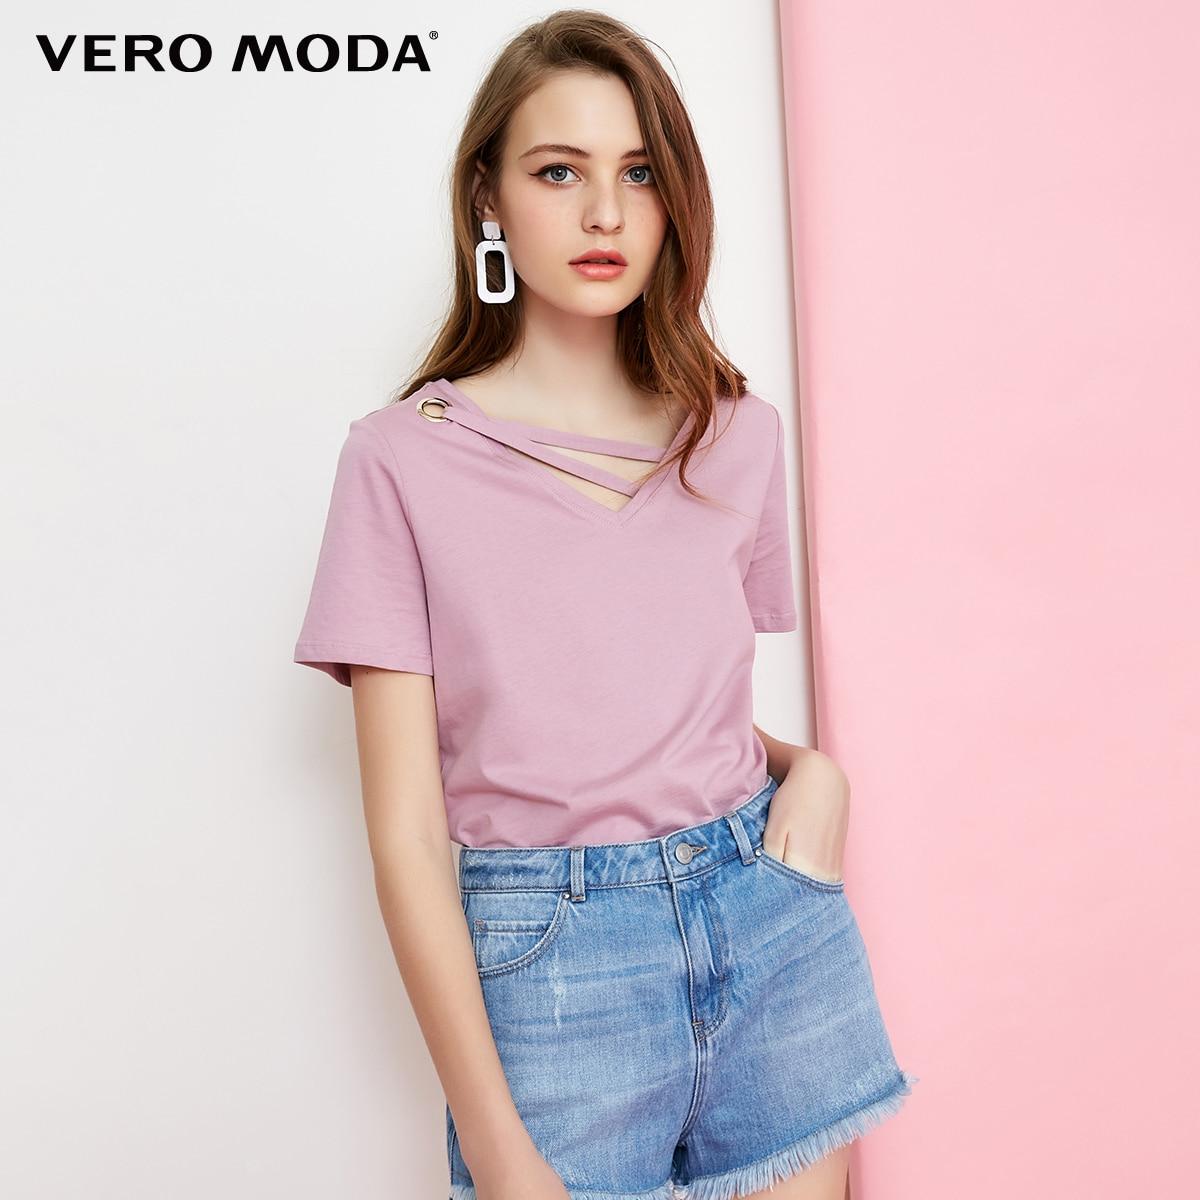 Vero Moda 100% Cotton Pure Color Collar Decorative Band Casual Short Sleeve T-shirt | 318101523